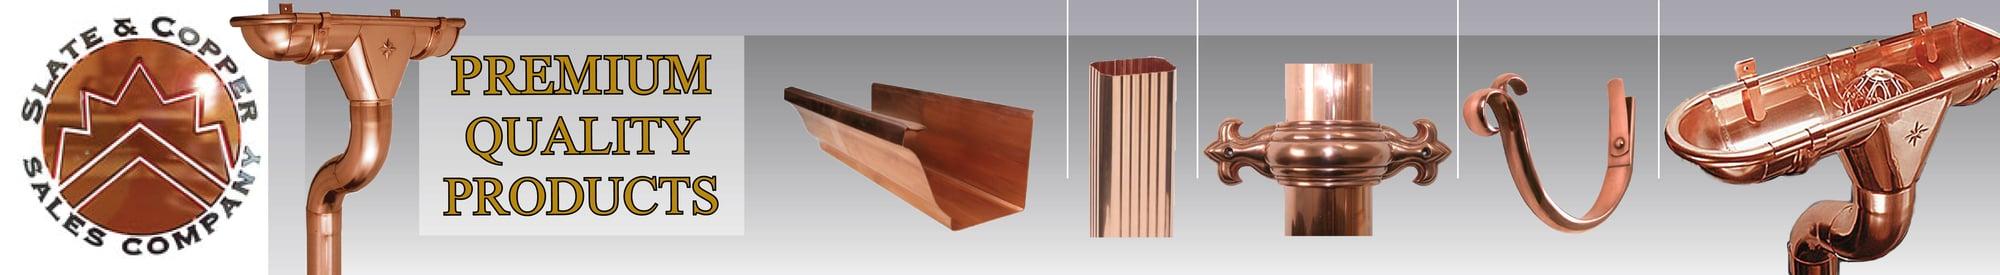 Copper Gutter Photo Gallery